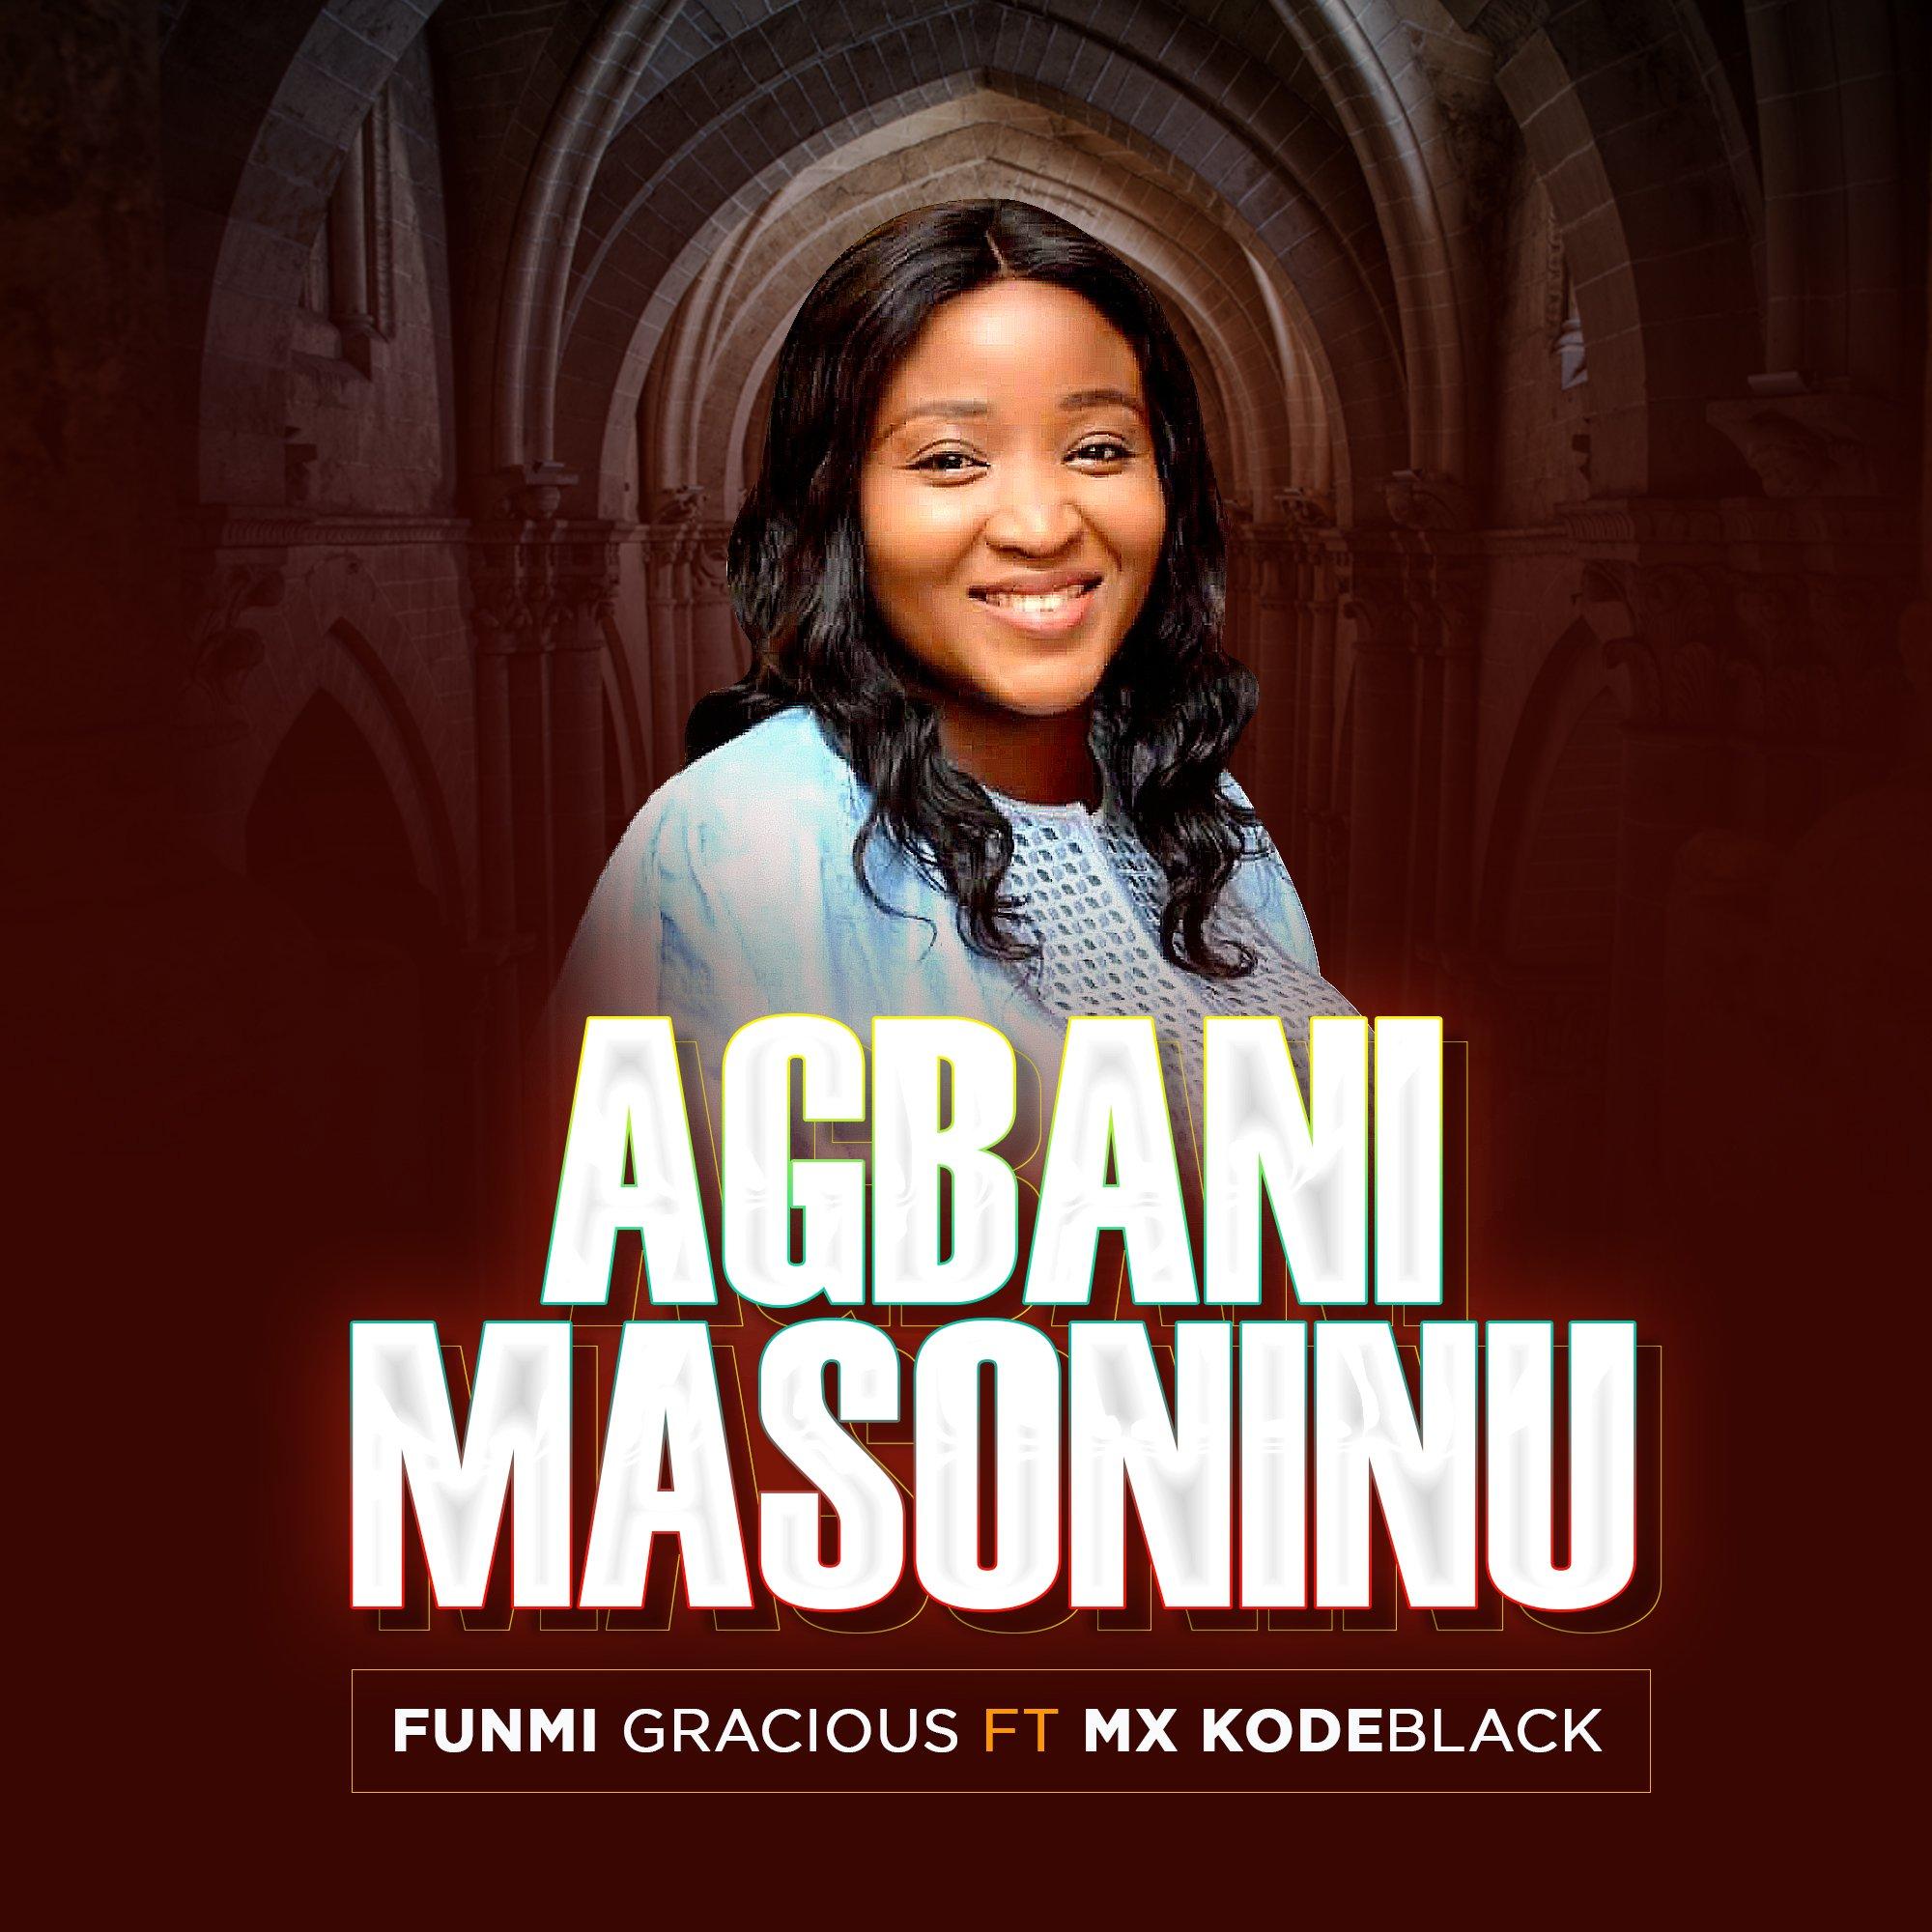 DOWNLOAD Music: Funmi Gracious – Agbani-masoninu (ft. Mx Kodeblack)